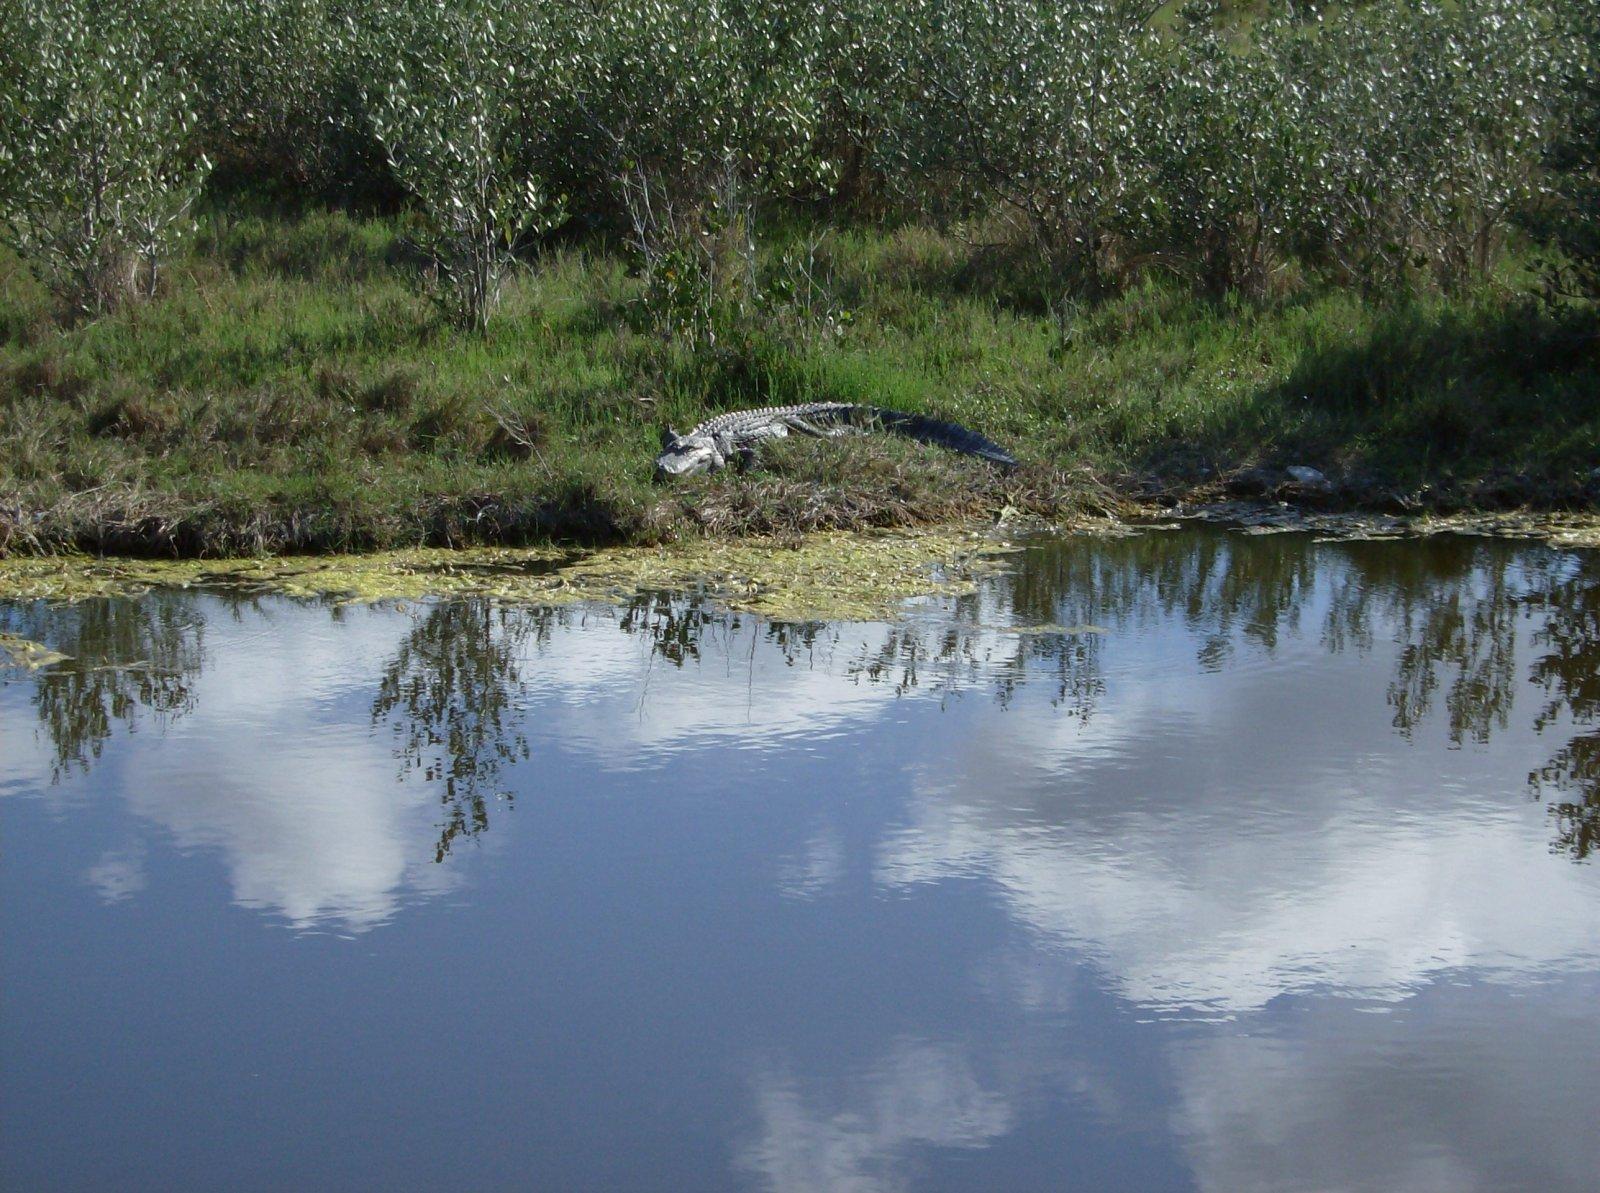 Click image for larger version  Name:Playalina Beach & Florida Gators 010.jpg Views:67 Size:399.1 KB ID:153353